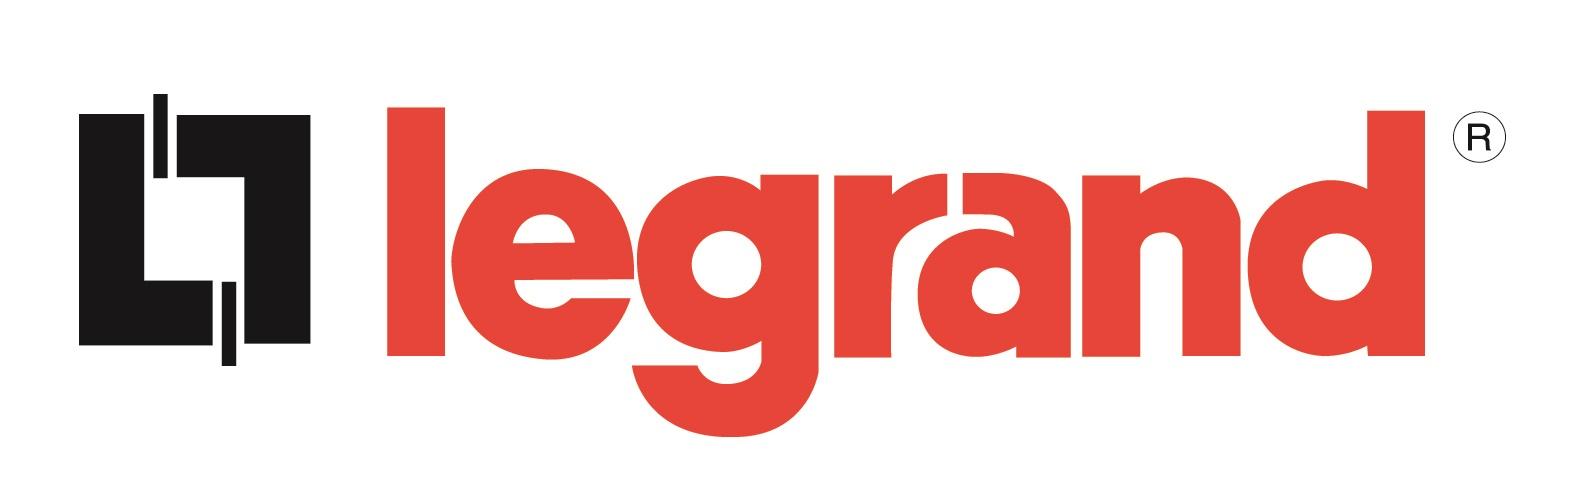 legrand_logo official